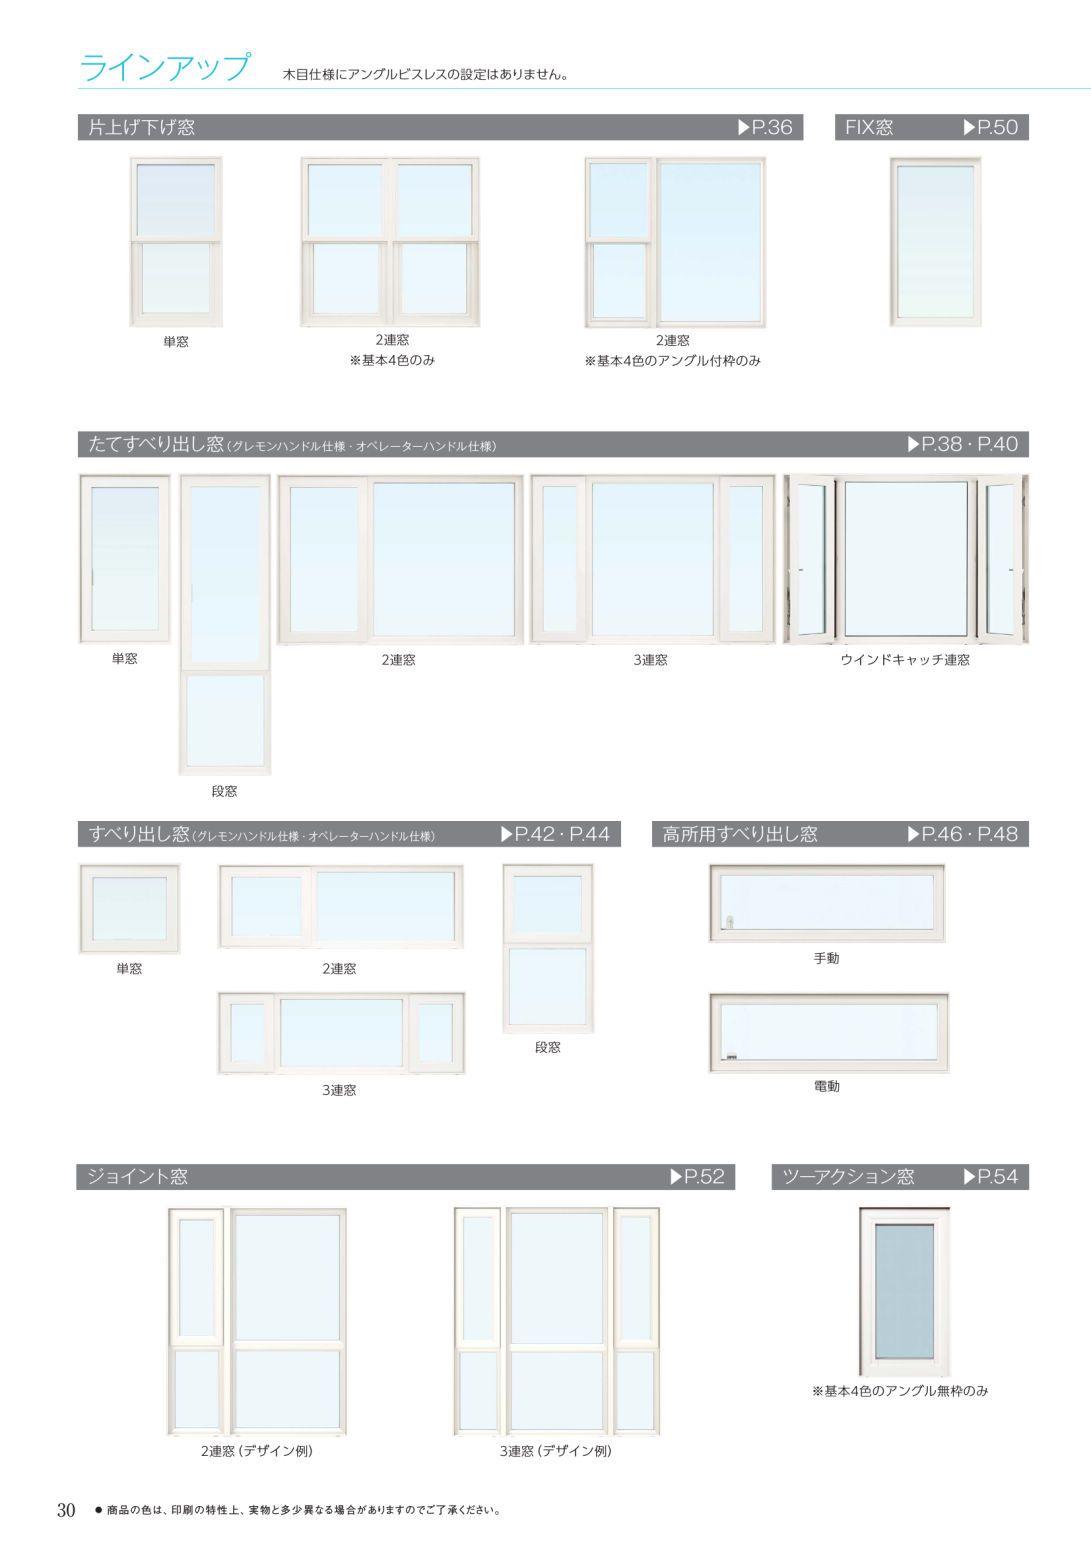 Apw330 商品カタログ カタログビュー 2020 カタログ ビュー 商品